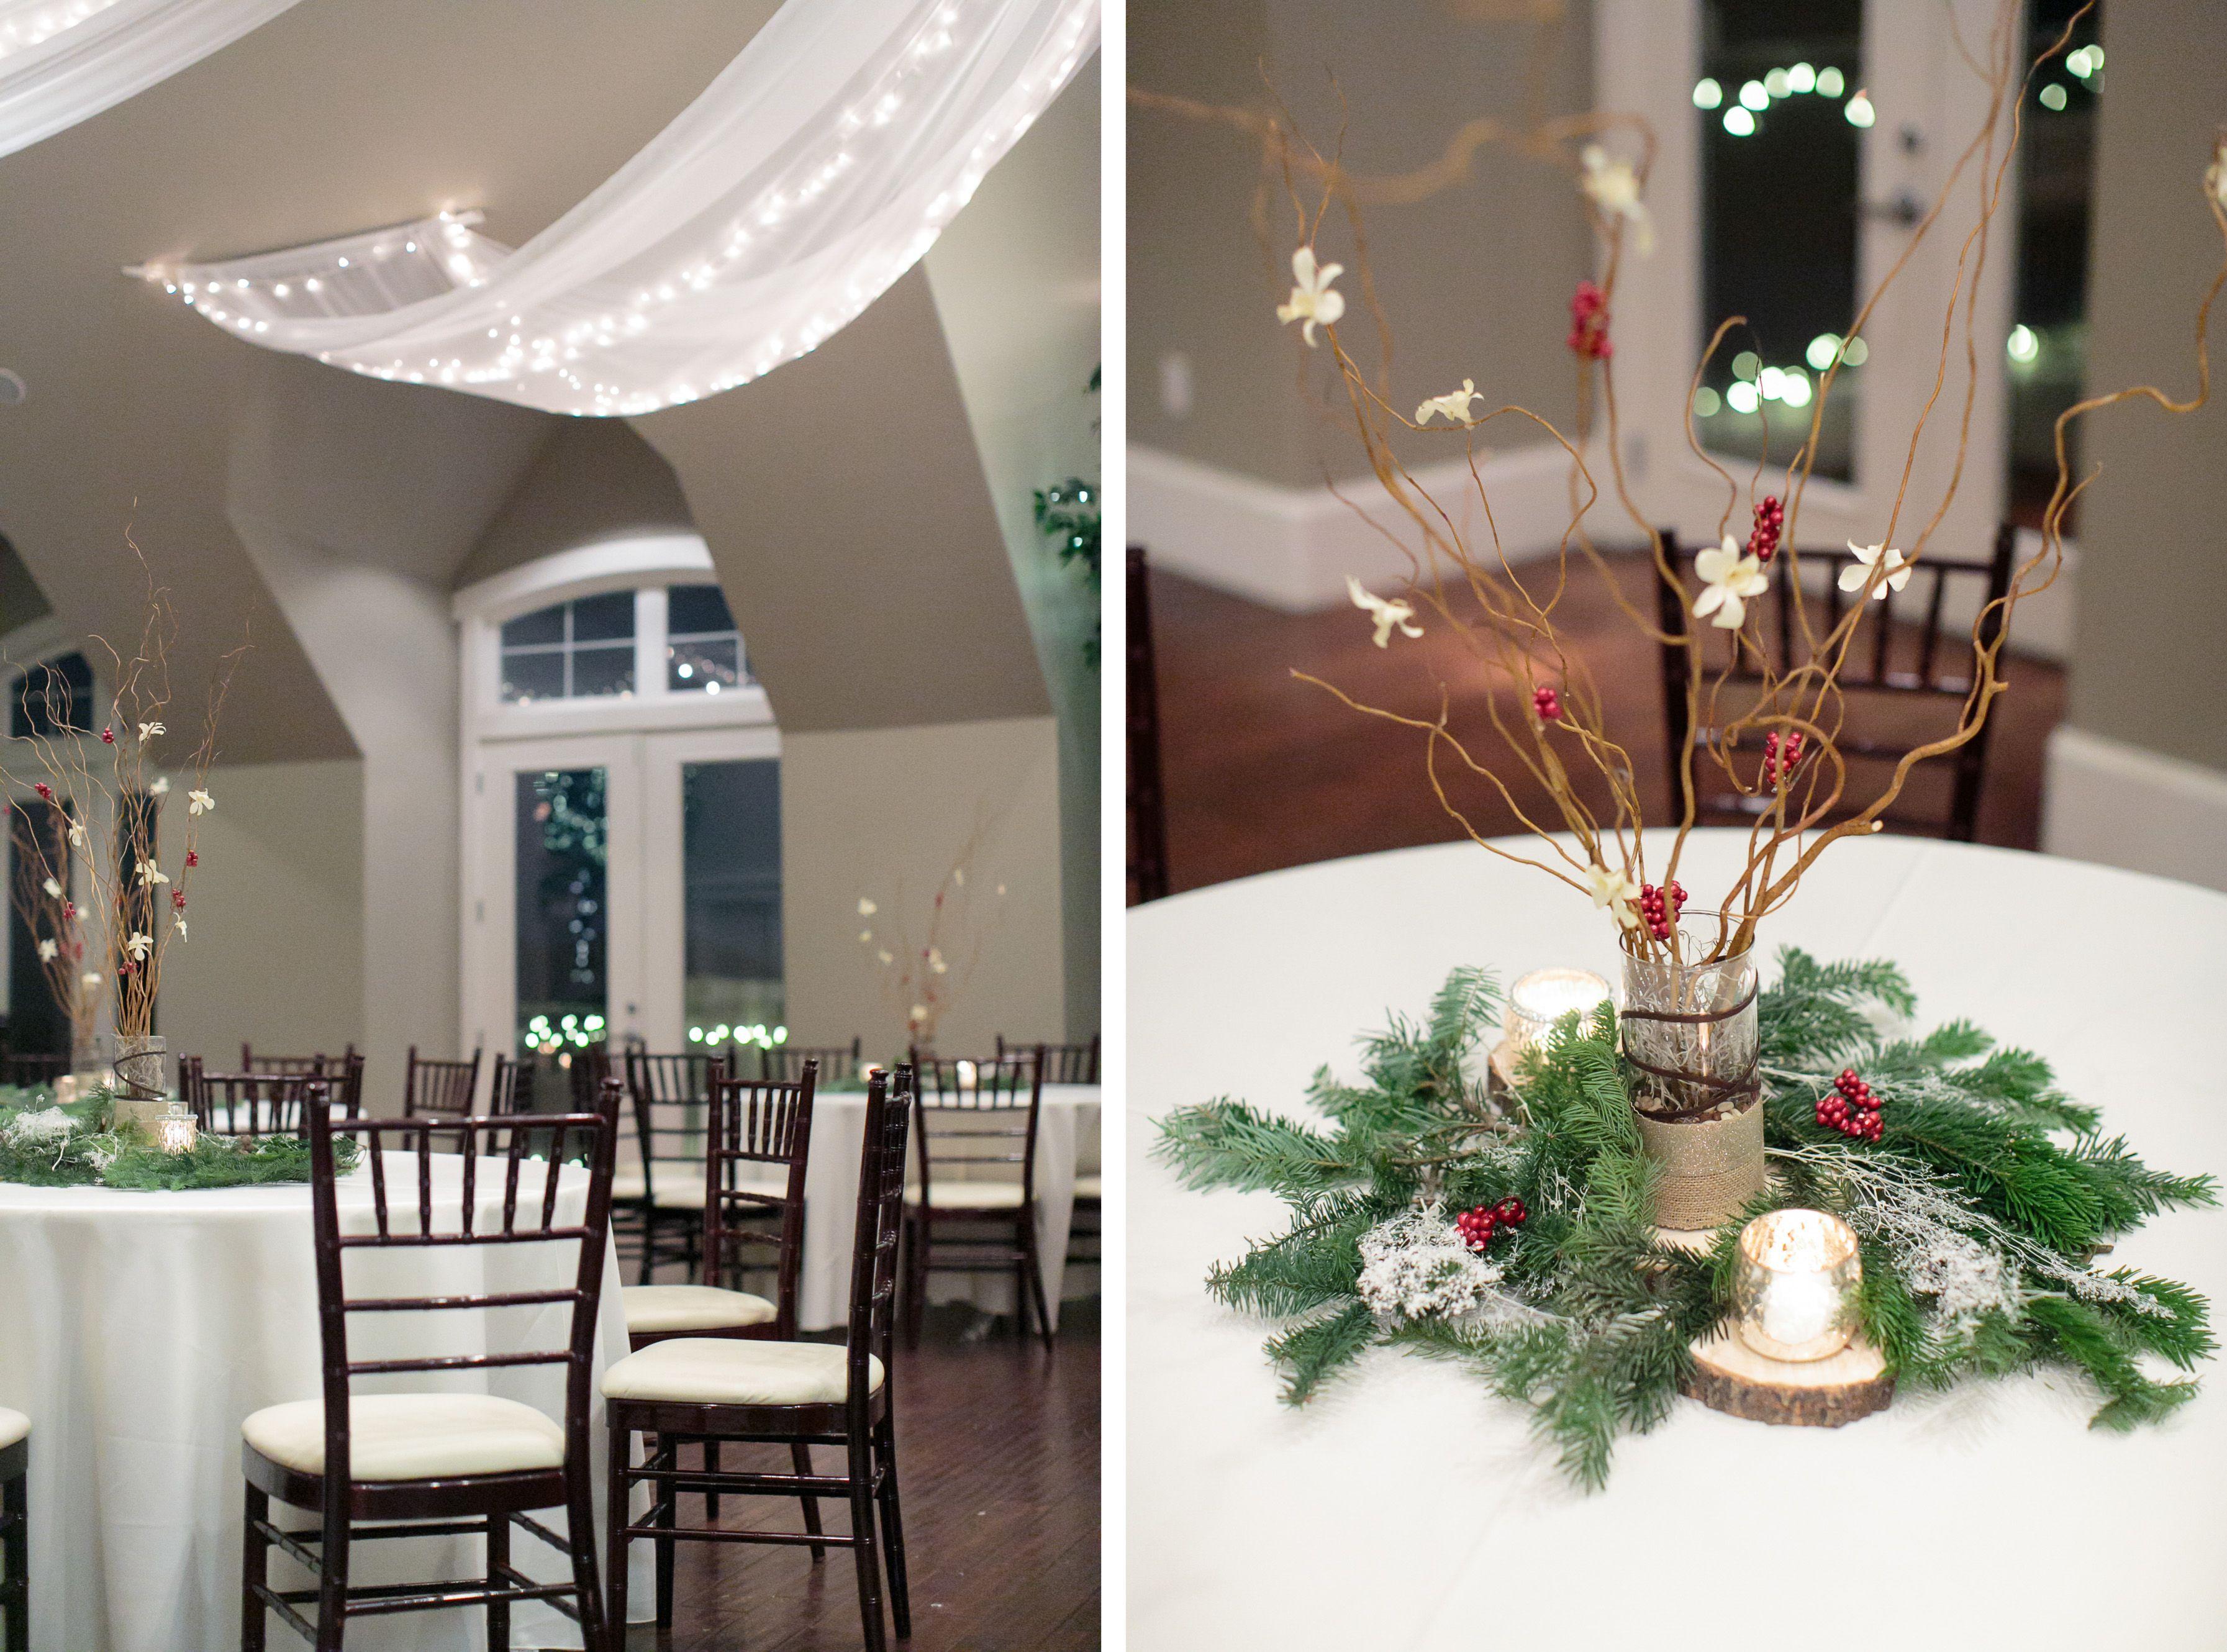 Sleepy Ridge Weddings & Events | Holiday Events & Decor | Utah Venue | EK Studios Photo & Video